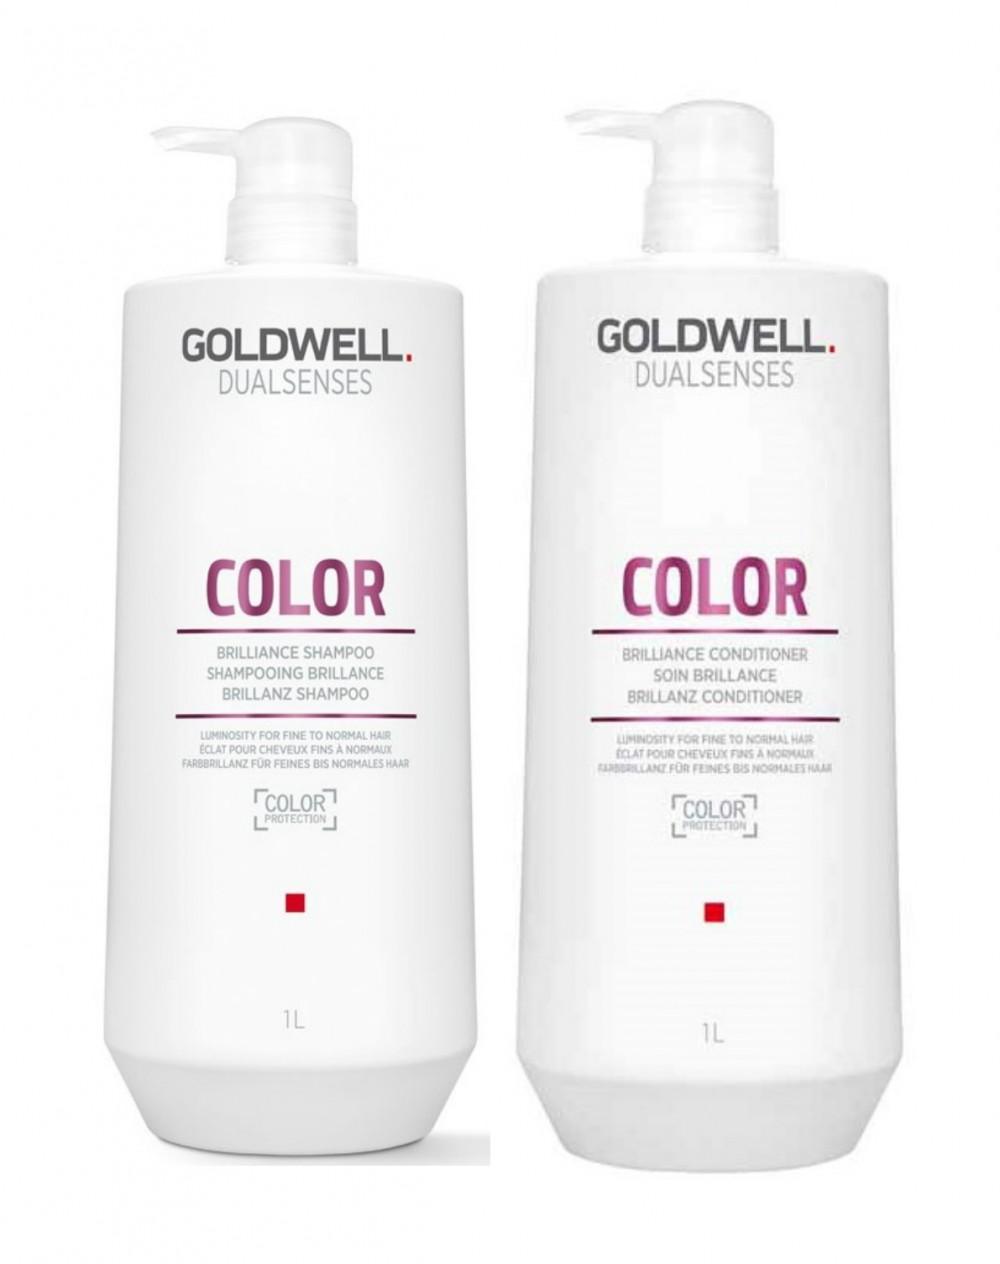 Goldwell Dualsenses Color Brillance Shampoo & Conditioner Duo Liters